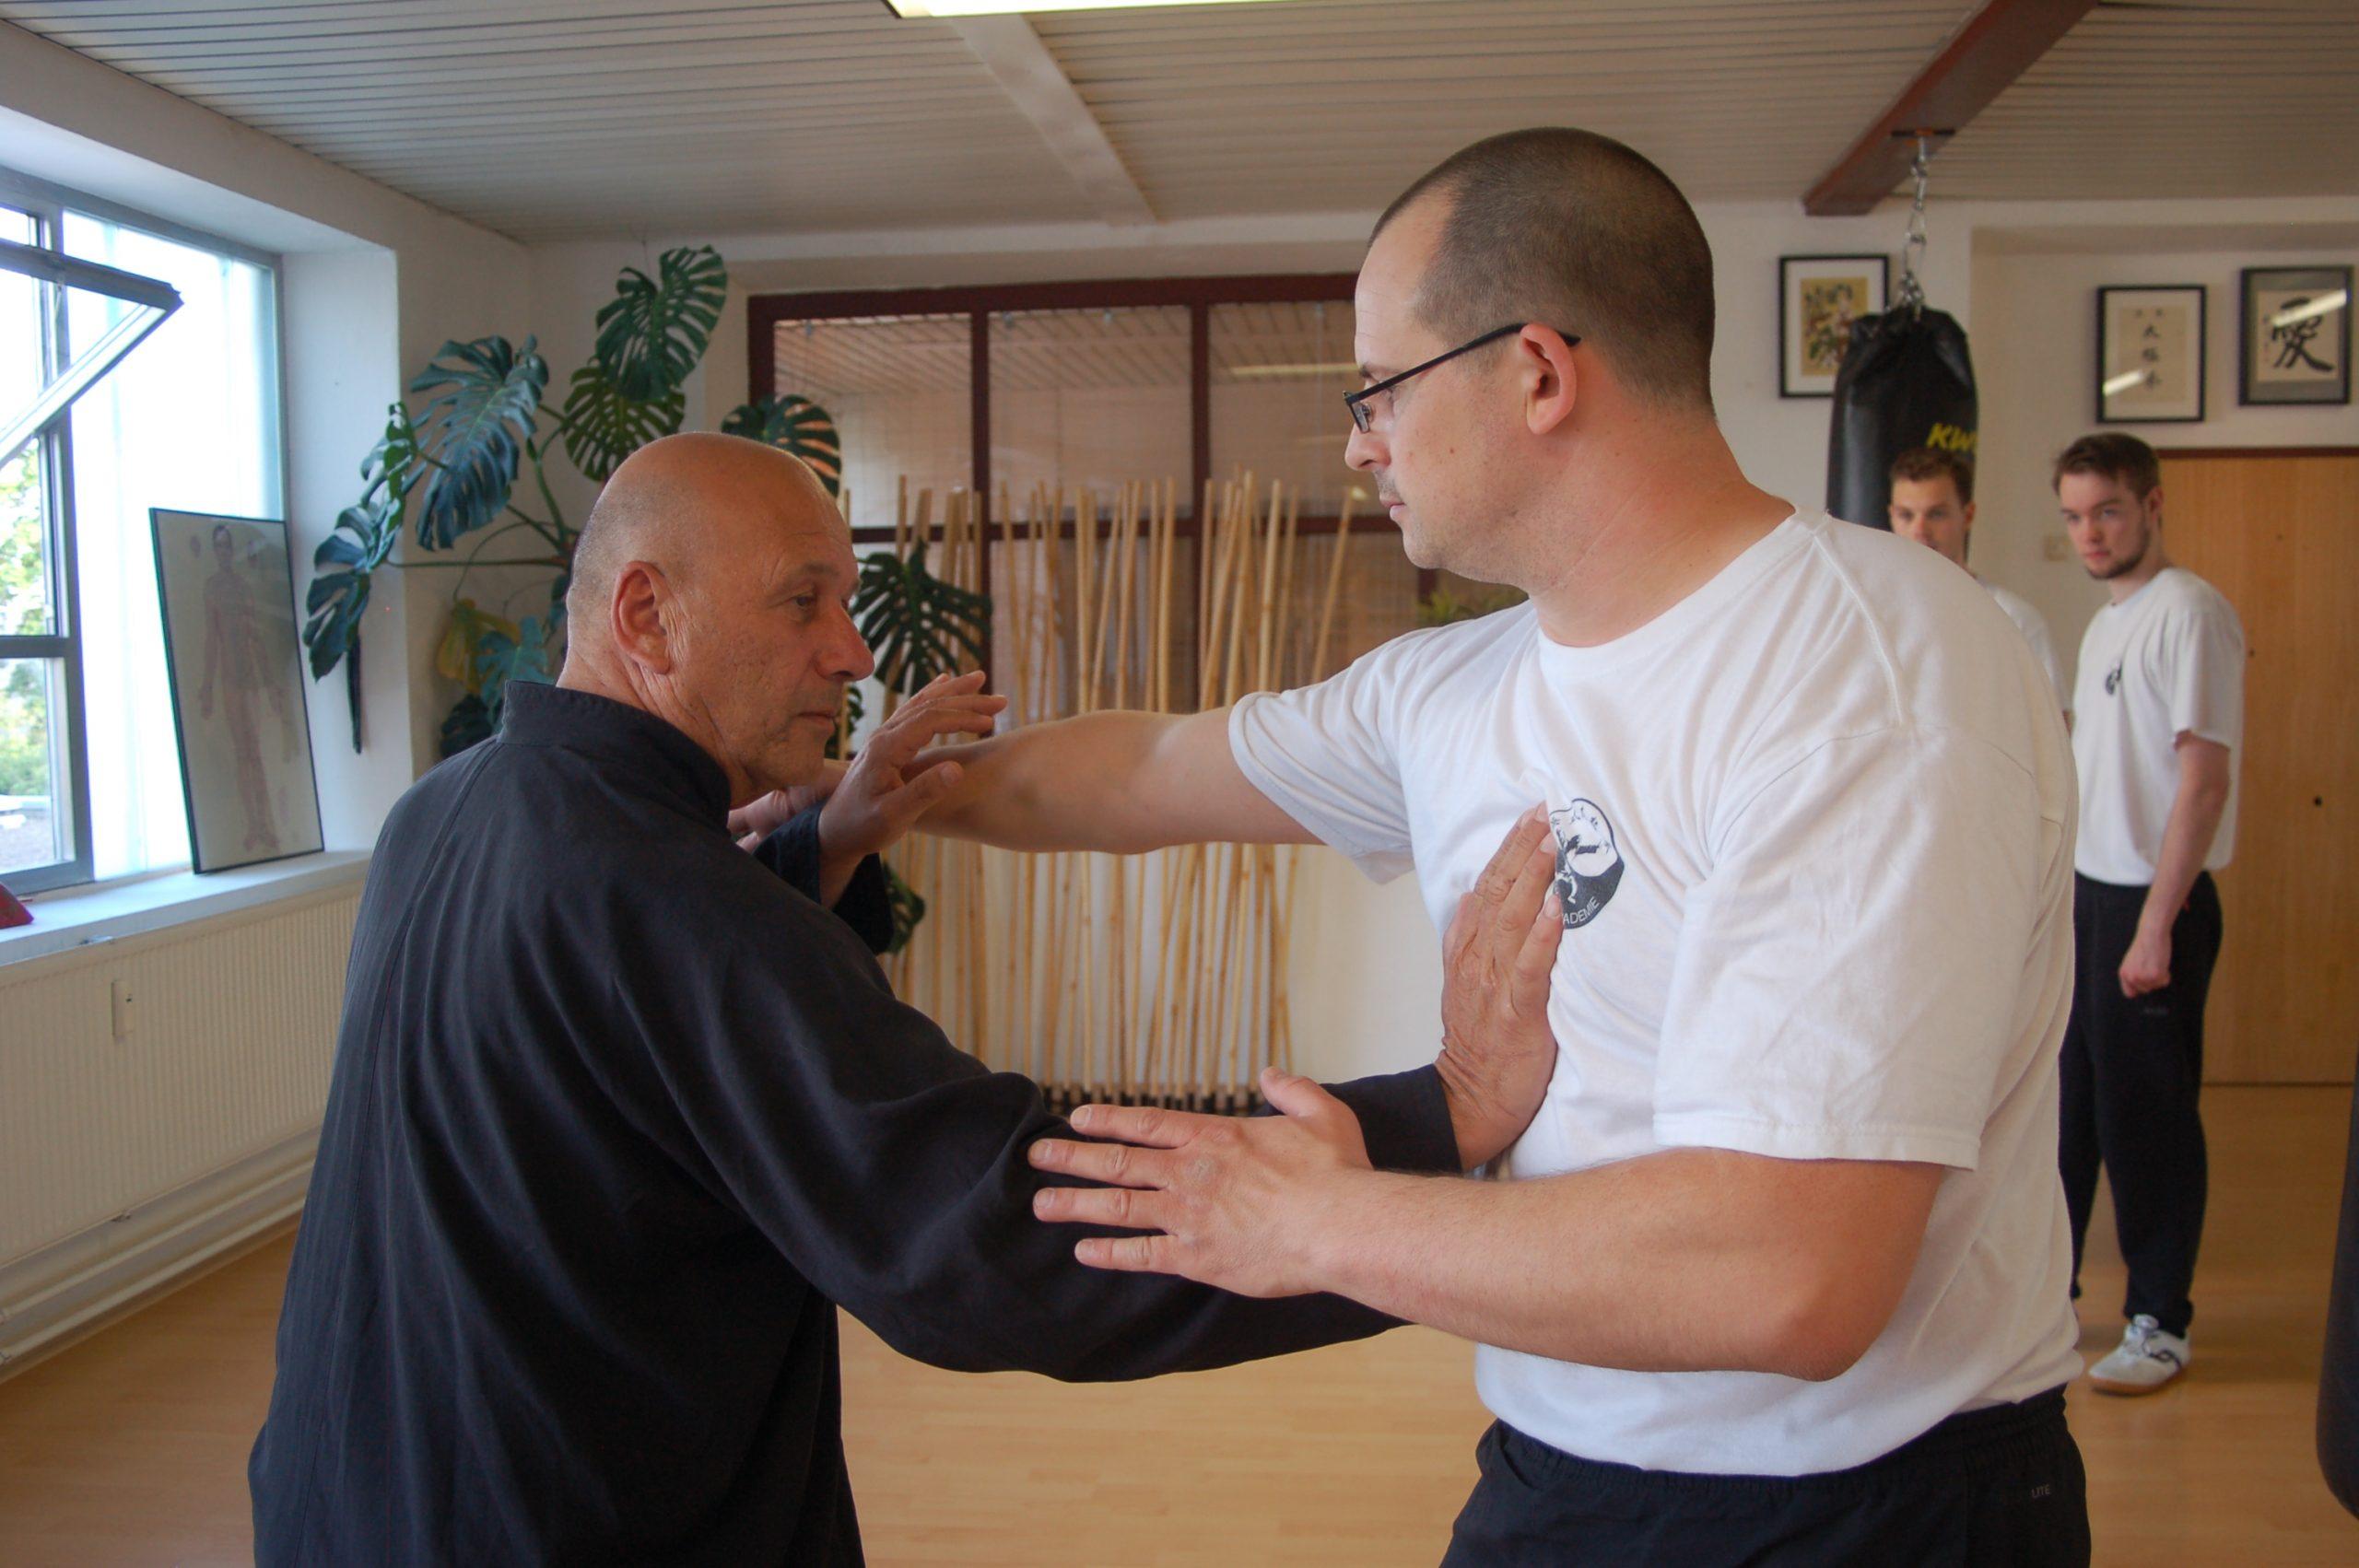 Tui Shou Workshop - Pushing Hands 推手 in Kelheim